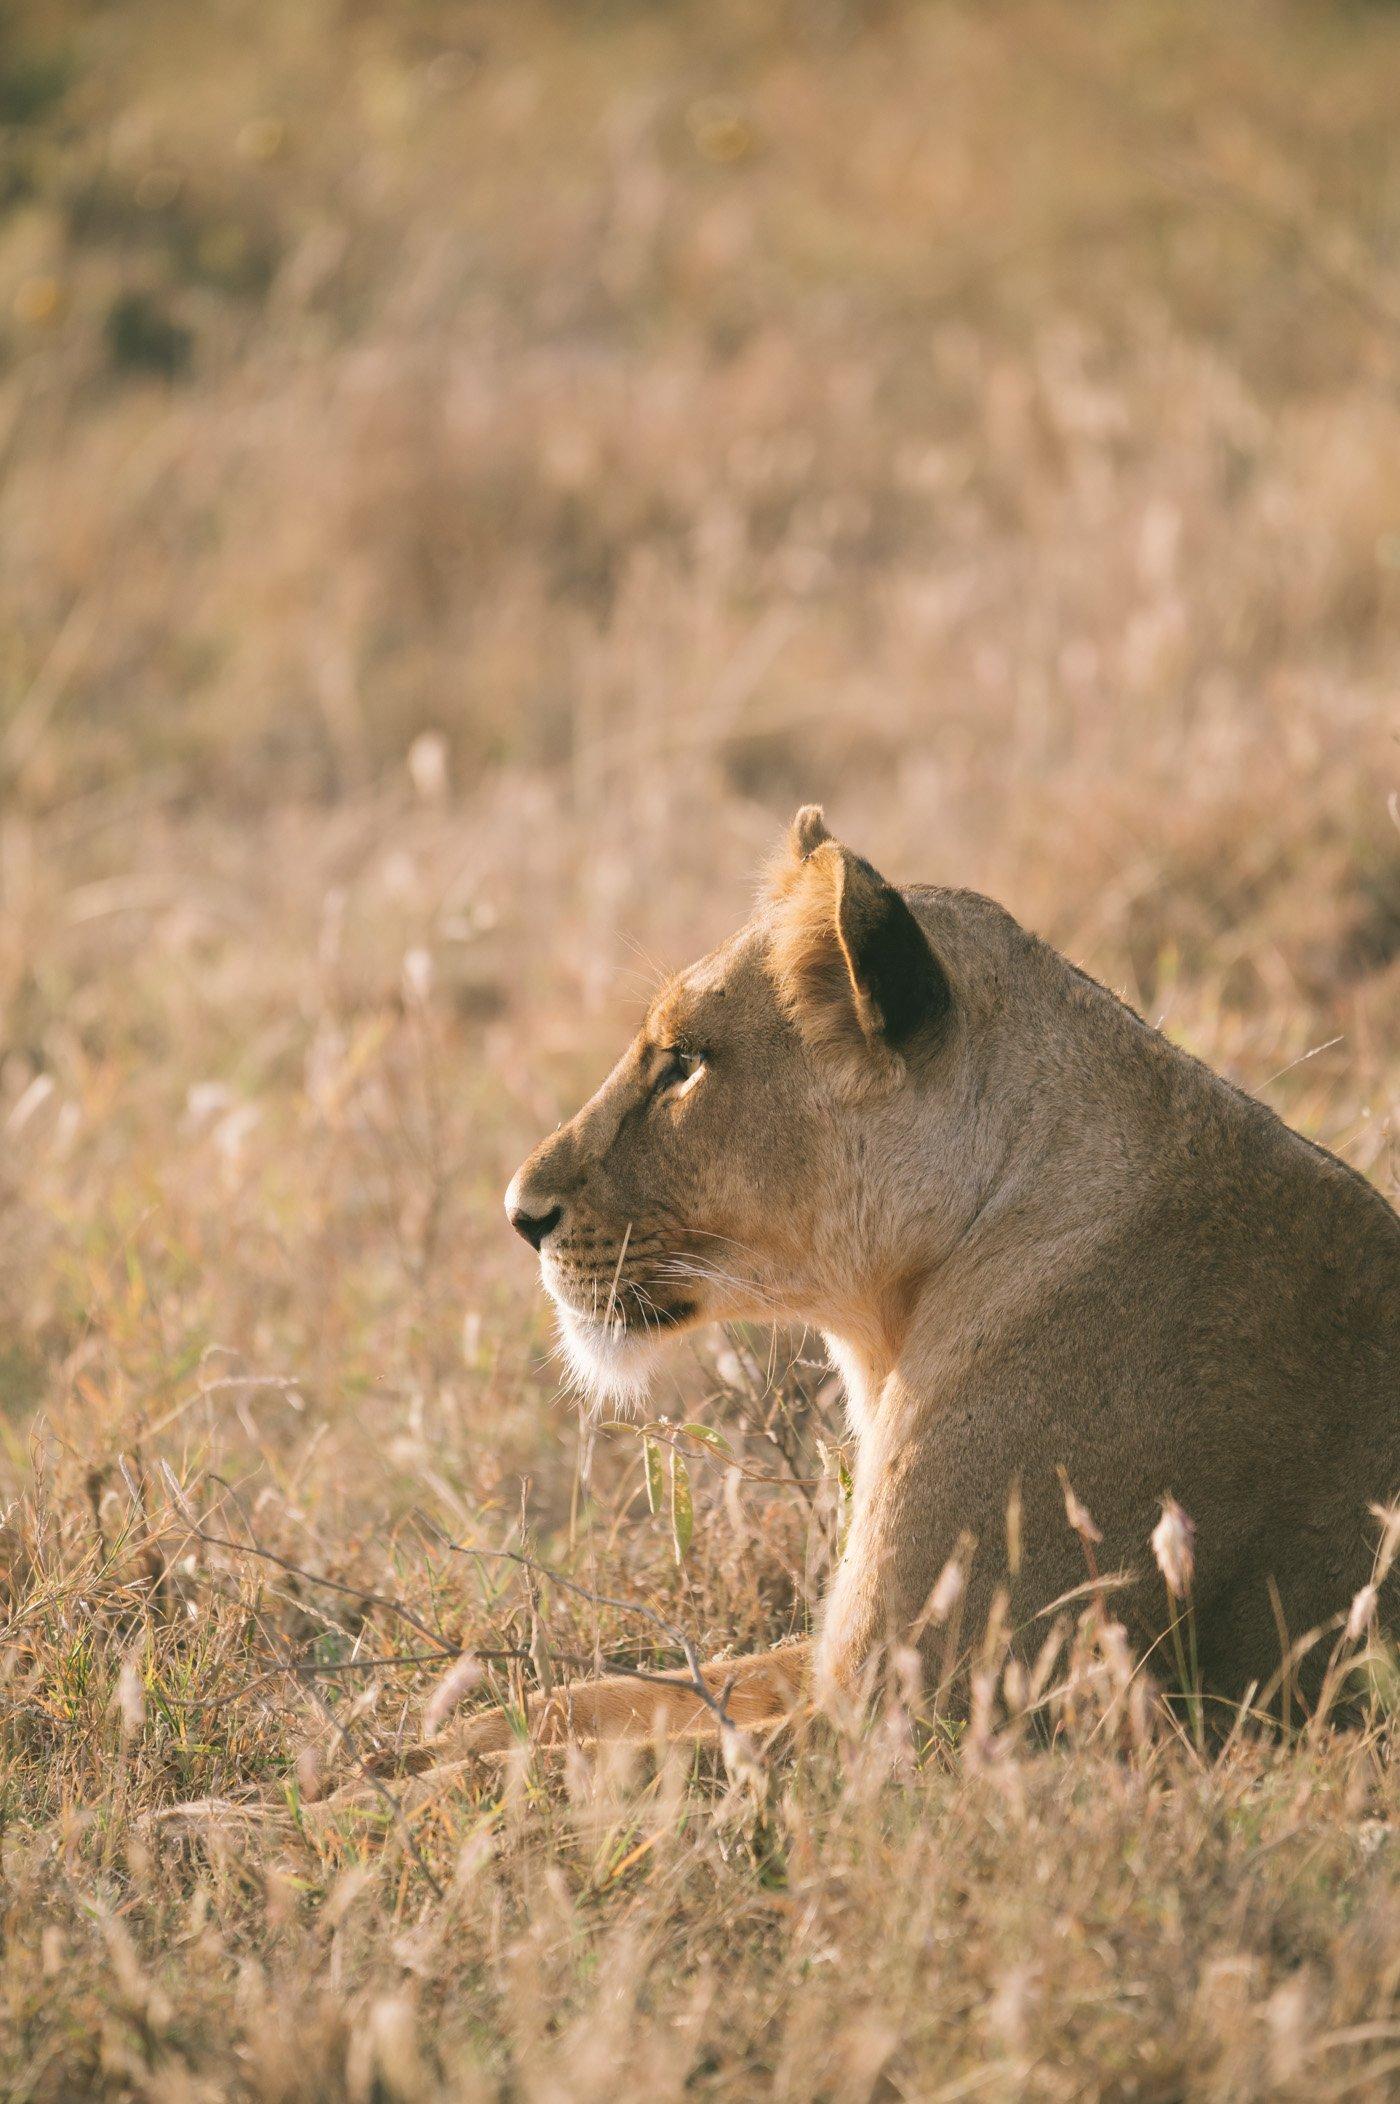 Lioness at Lewa Wildlife Conservancy Kenya